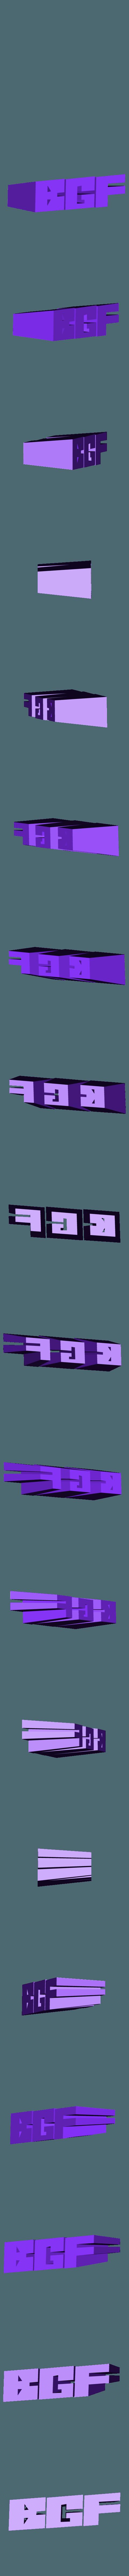 BGF_bordeaux_geek_festival_7.stl Download free STL file BGF trophées - printed by dagoma • 3D printable model, dagomafr